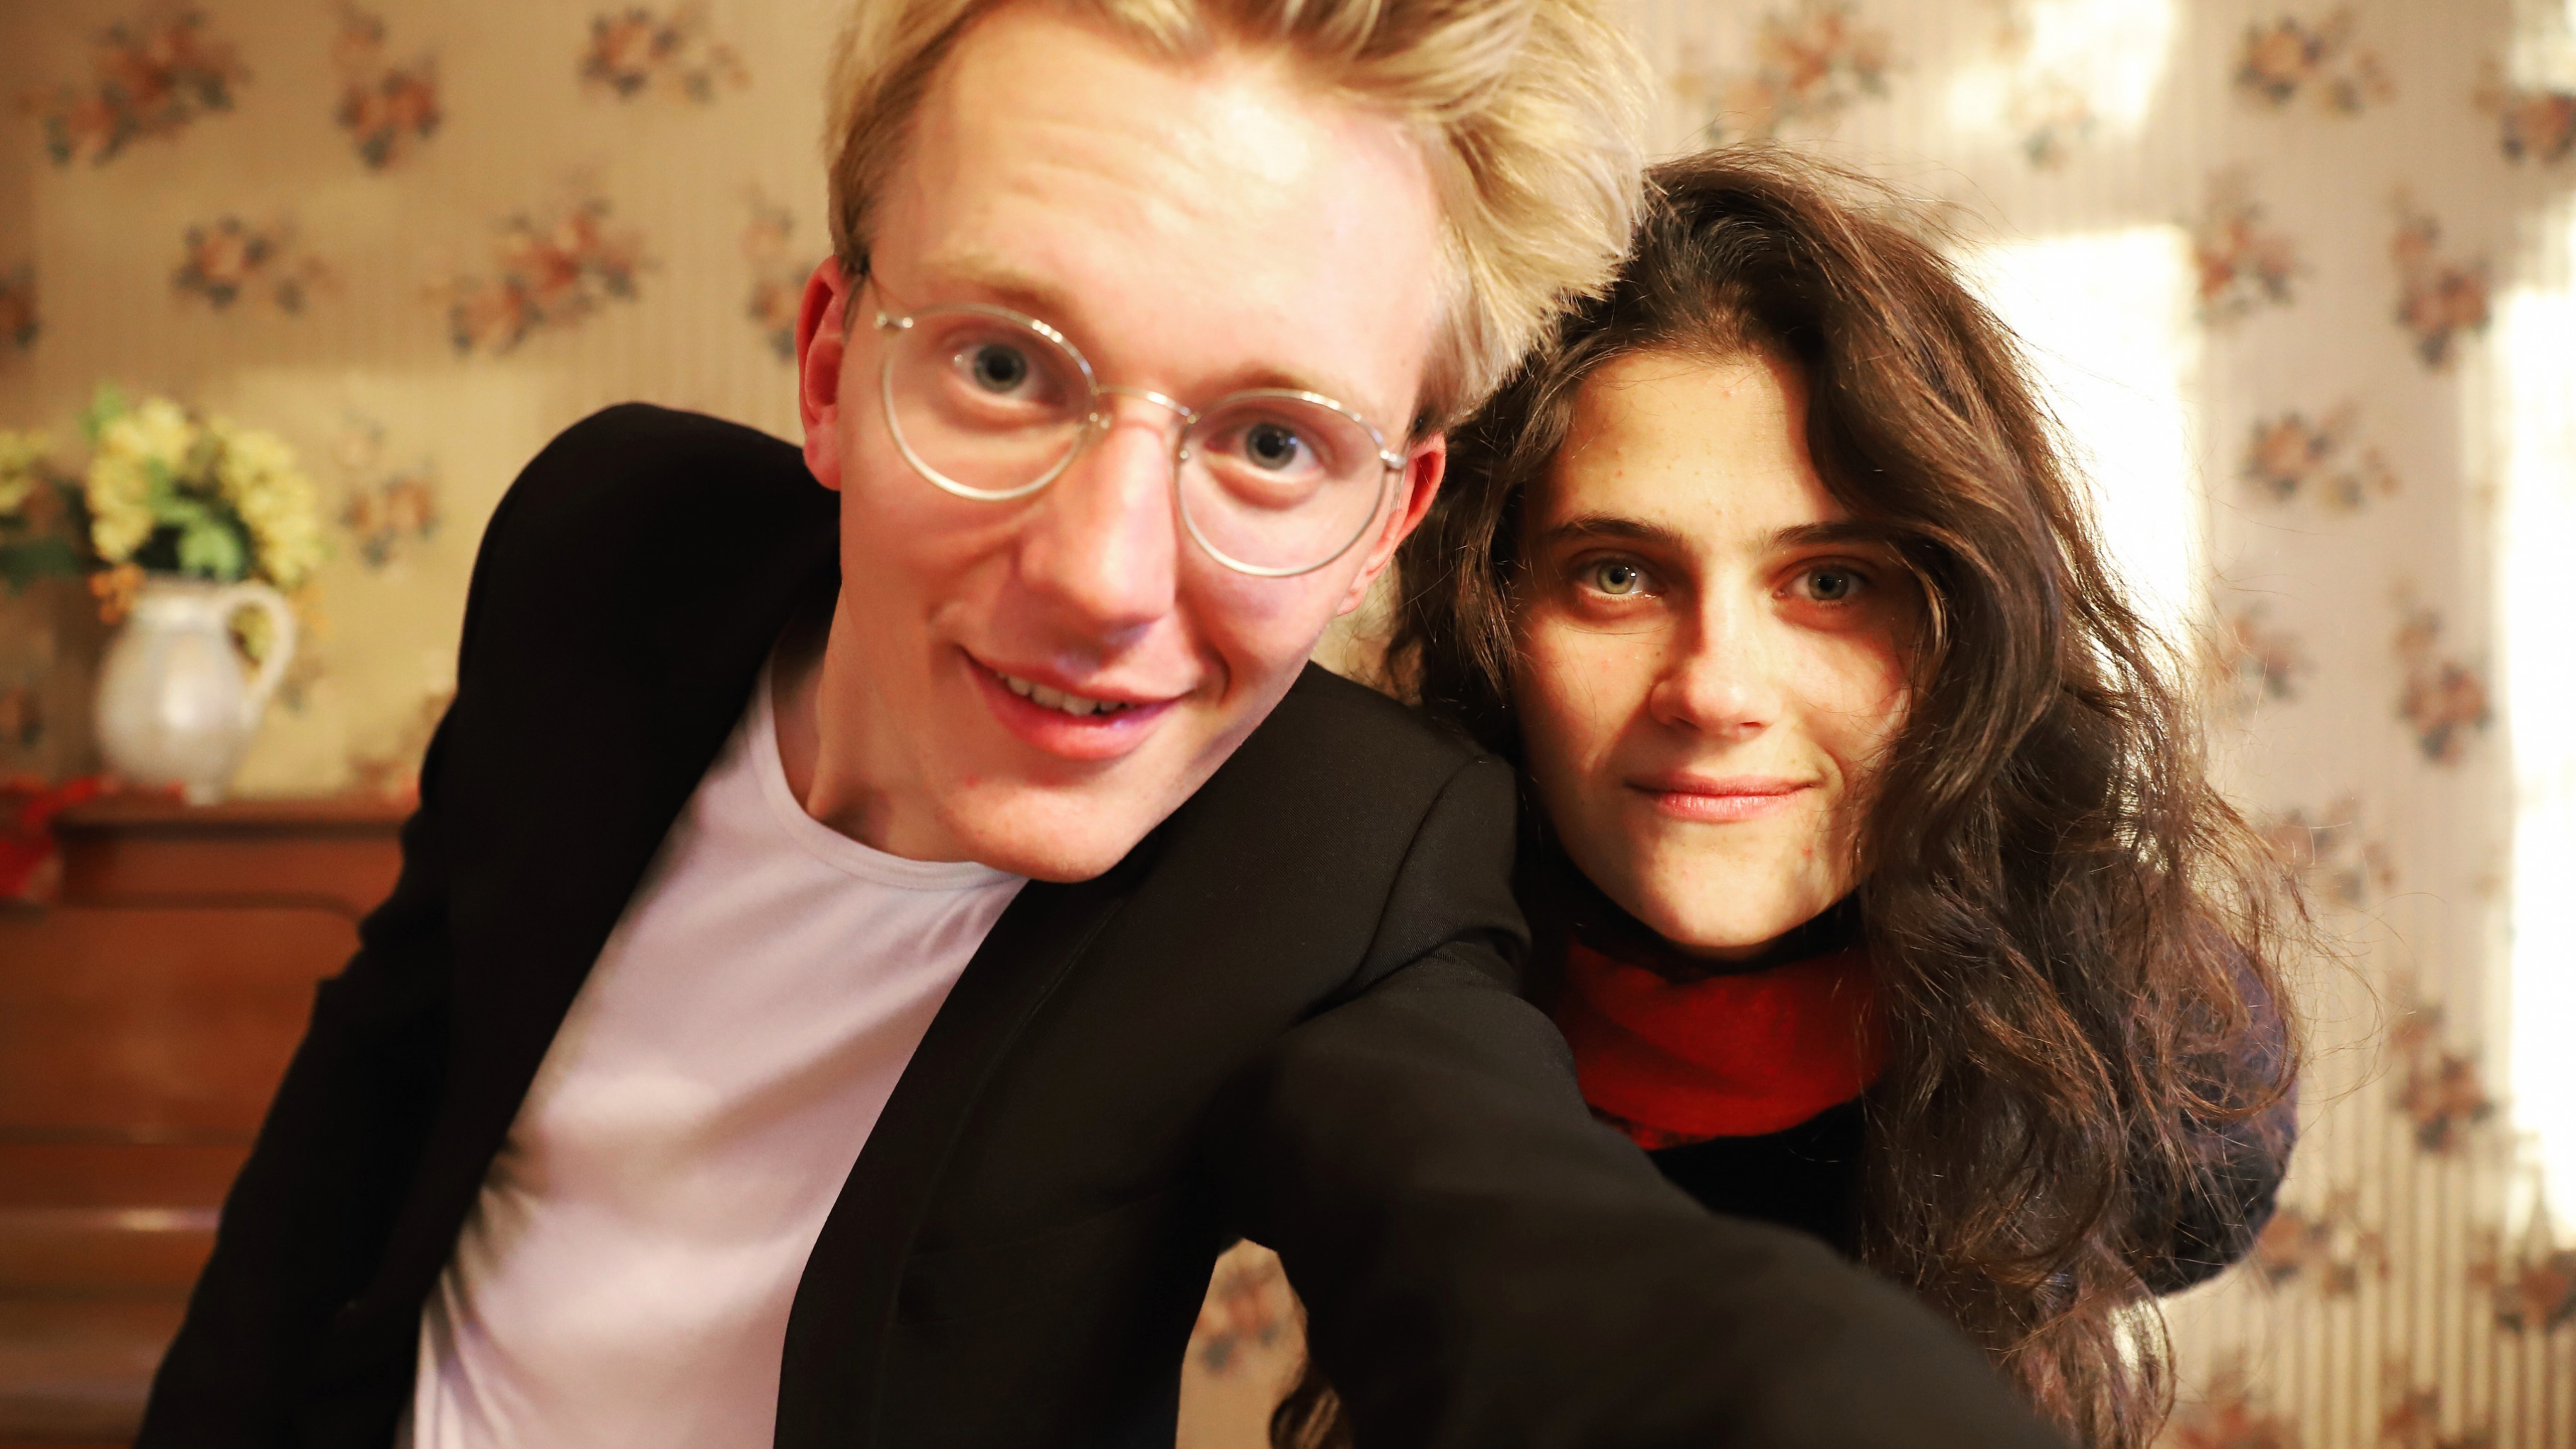 Duo Viktoria spielt bei der Eröffnung des neuen Oxfam Shops Berlin-Kreuzberg